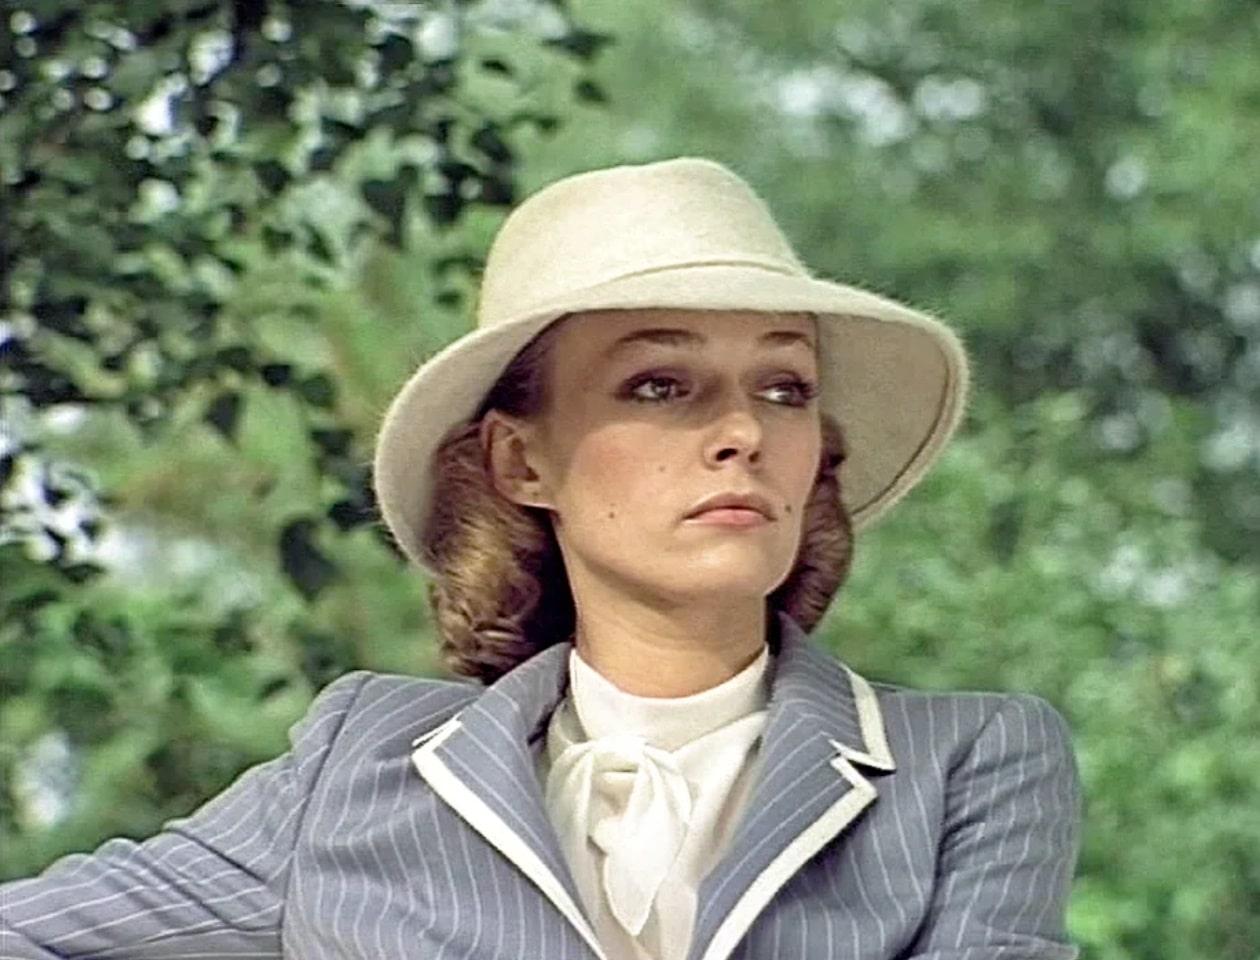 Мэри Поппинс, до свидания / Meri Poppins, do svidaniya (1984): кадр из фильма